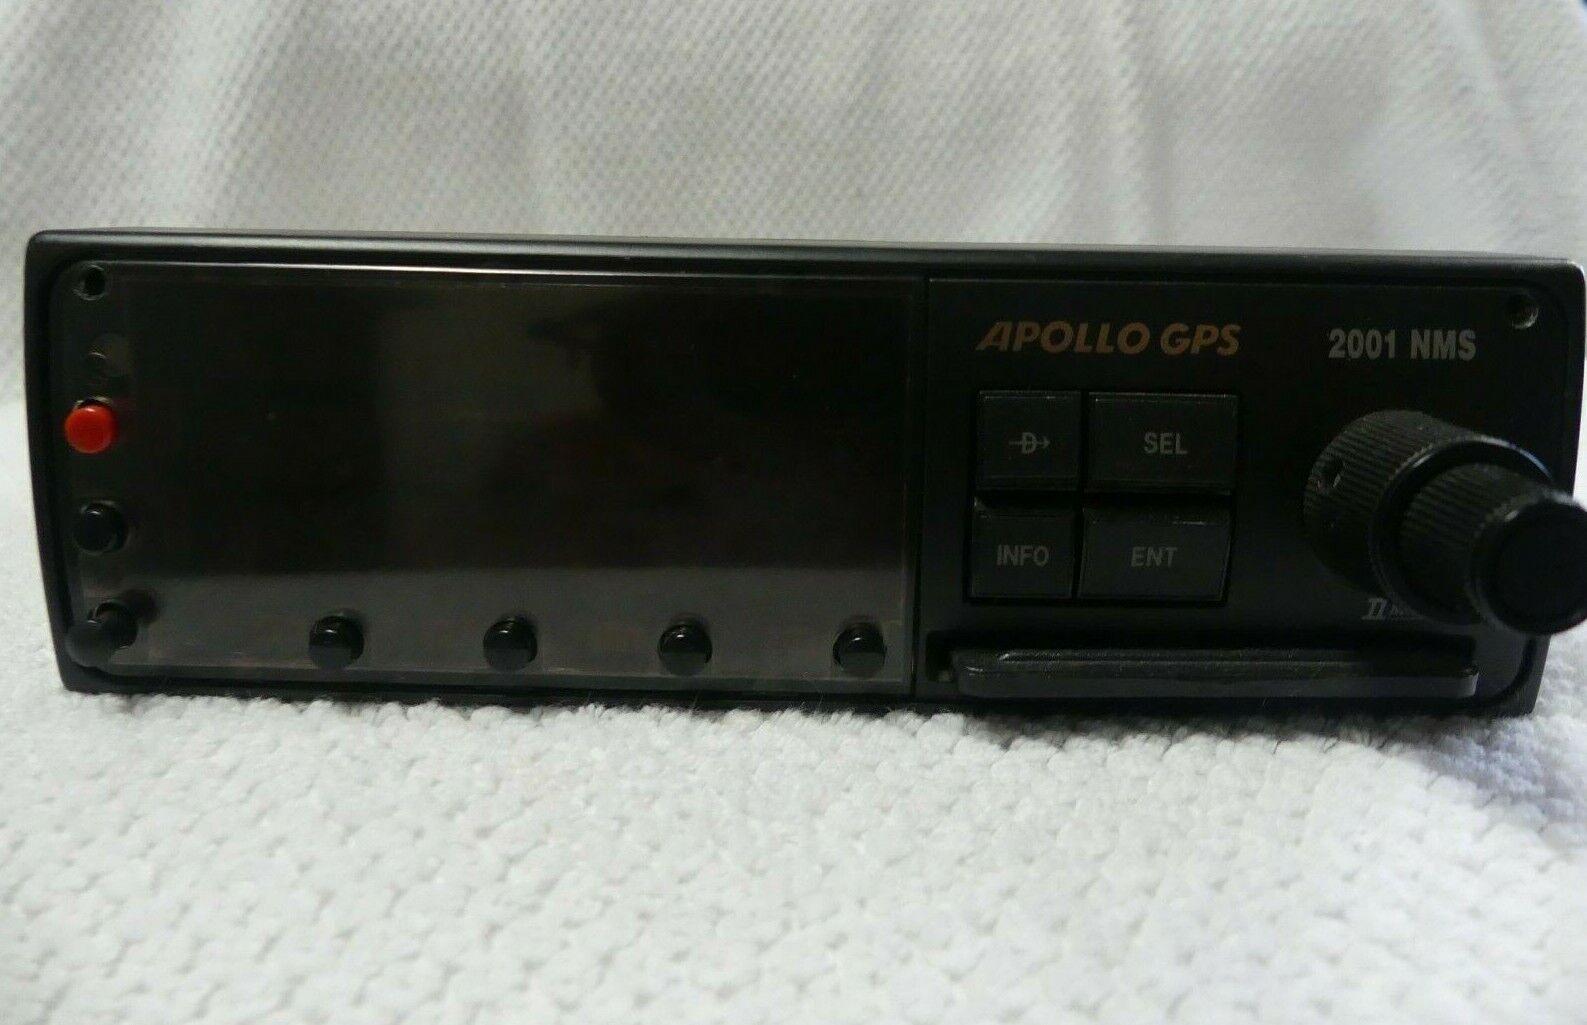 Apollo GPS 2001 NMS